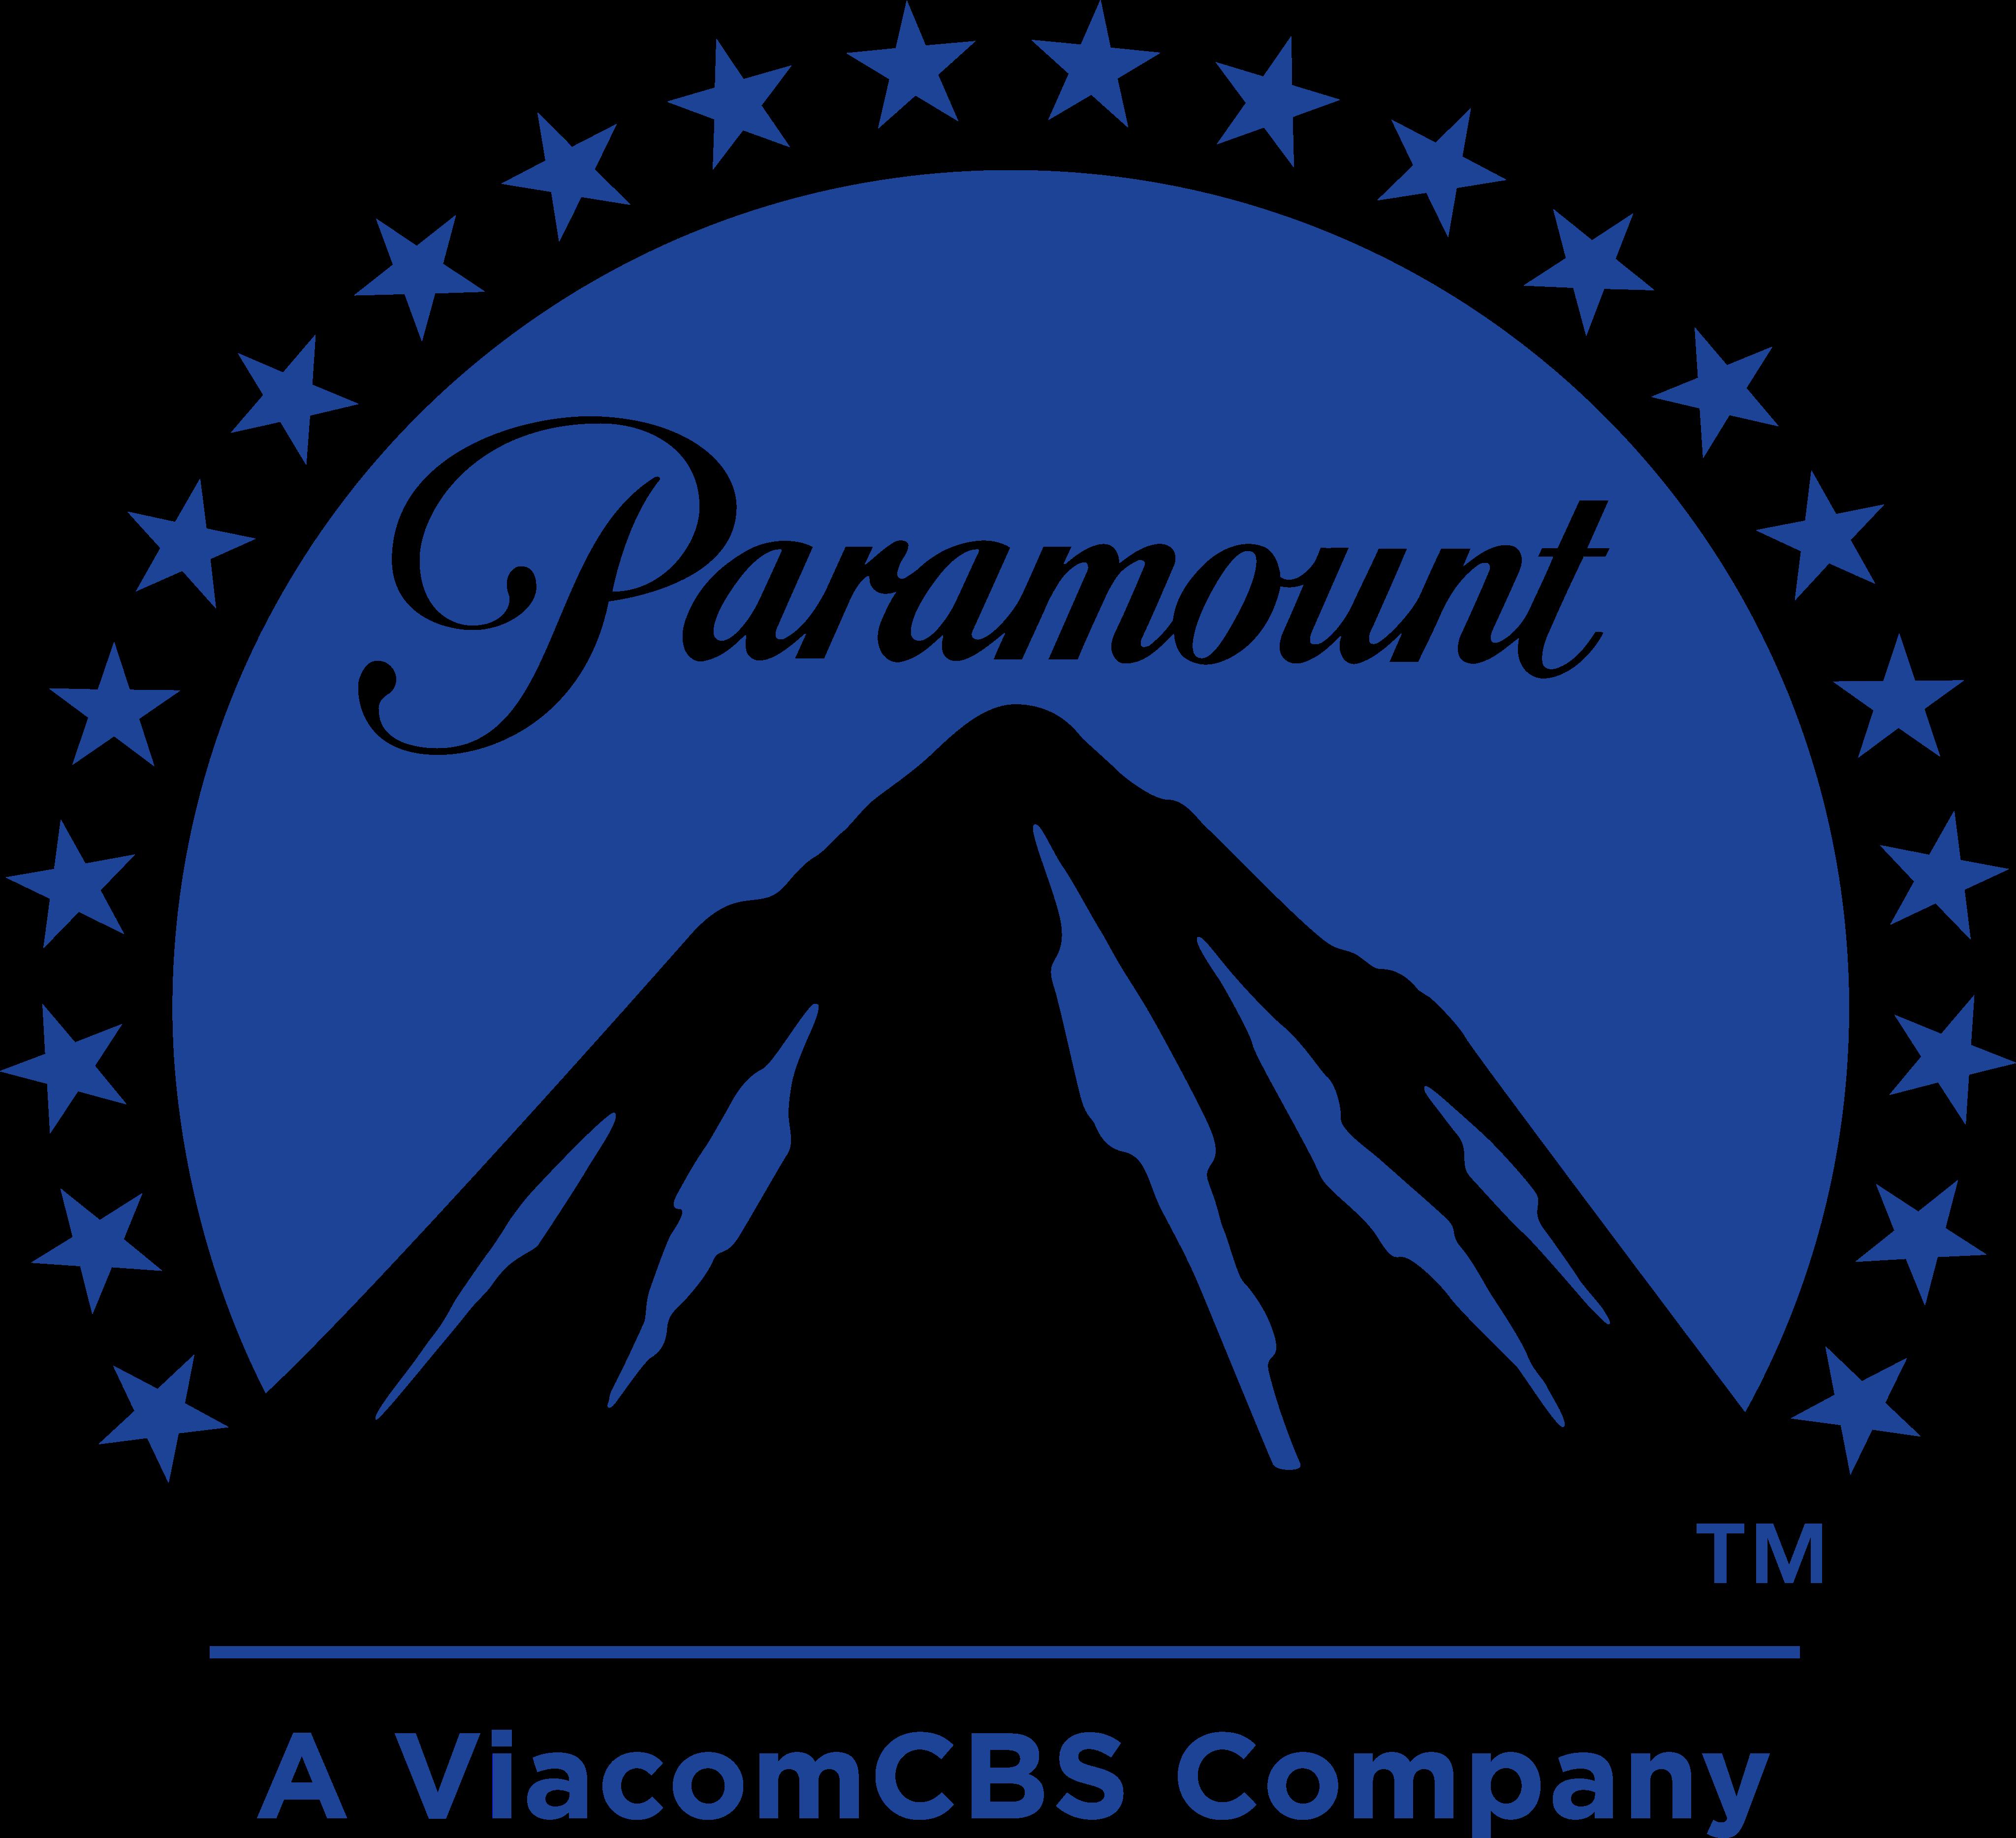 paramount logo 1 - Paramount Logo